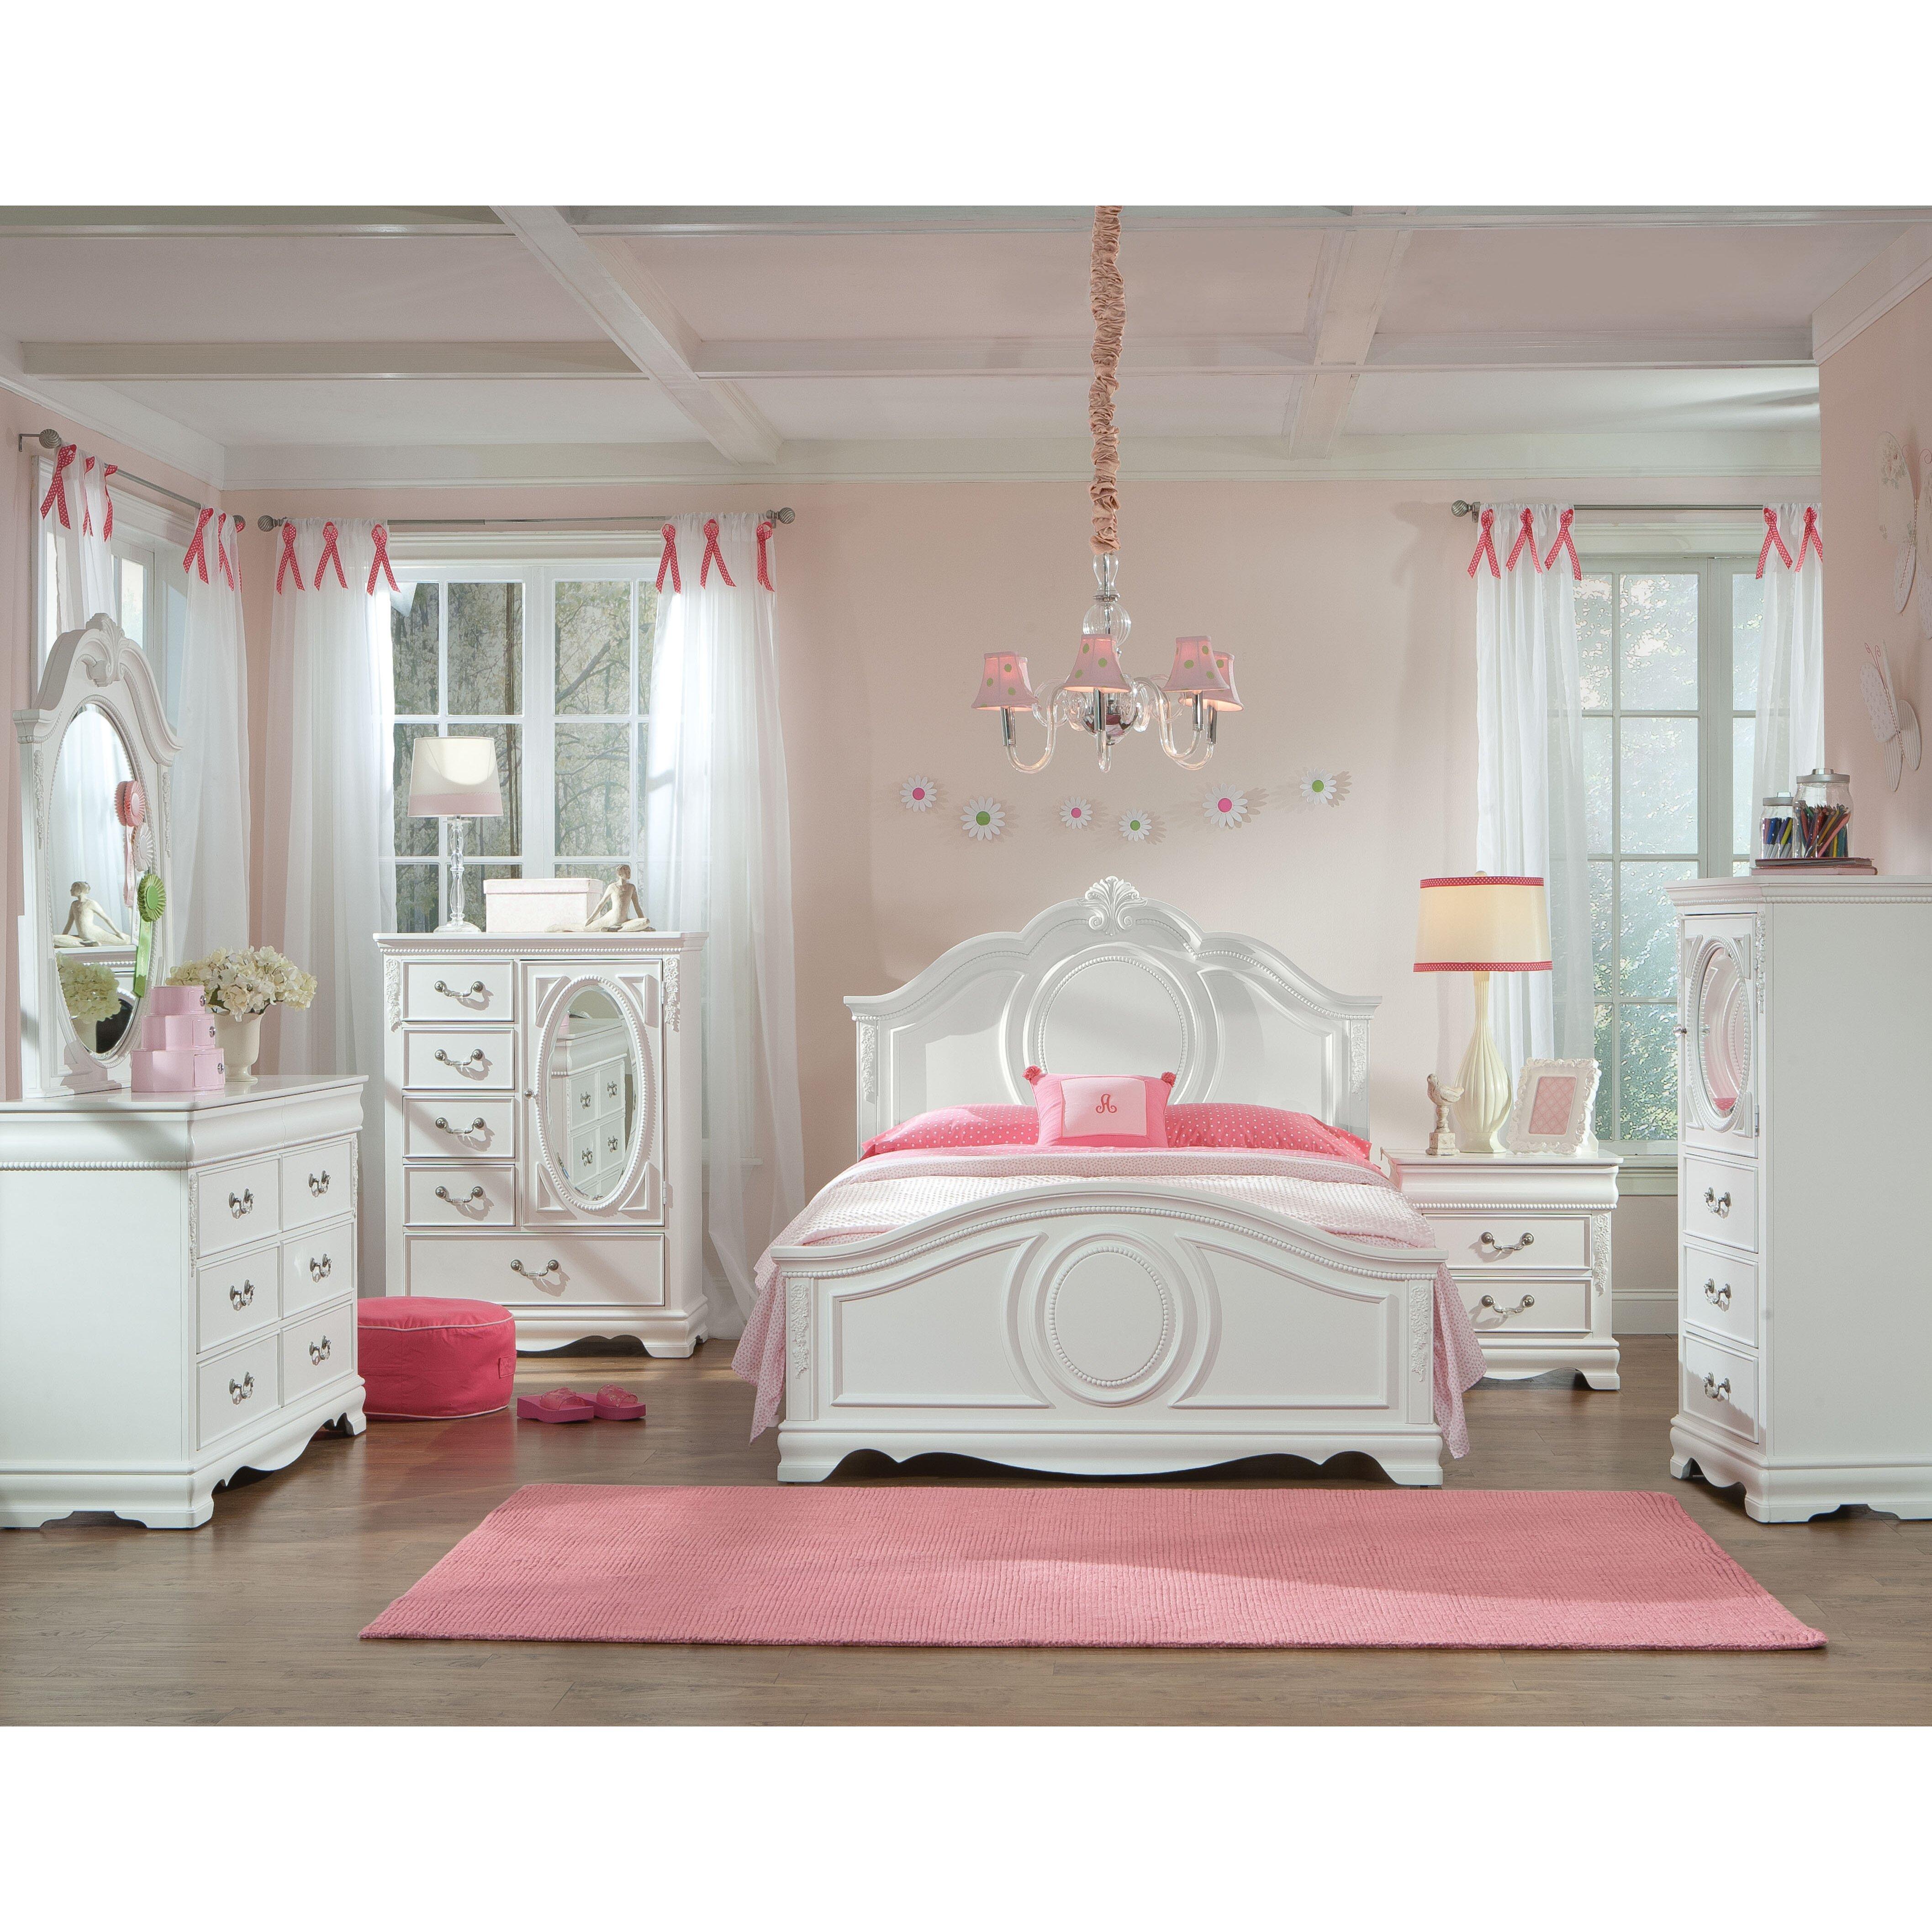 kids bedroom setBest Furniture Decor Ideas